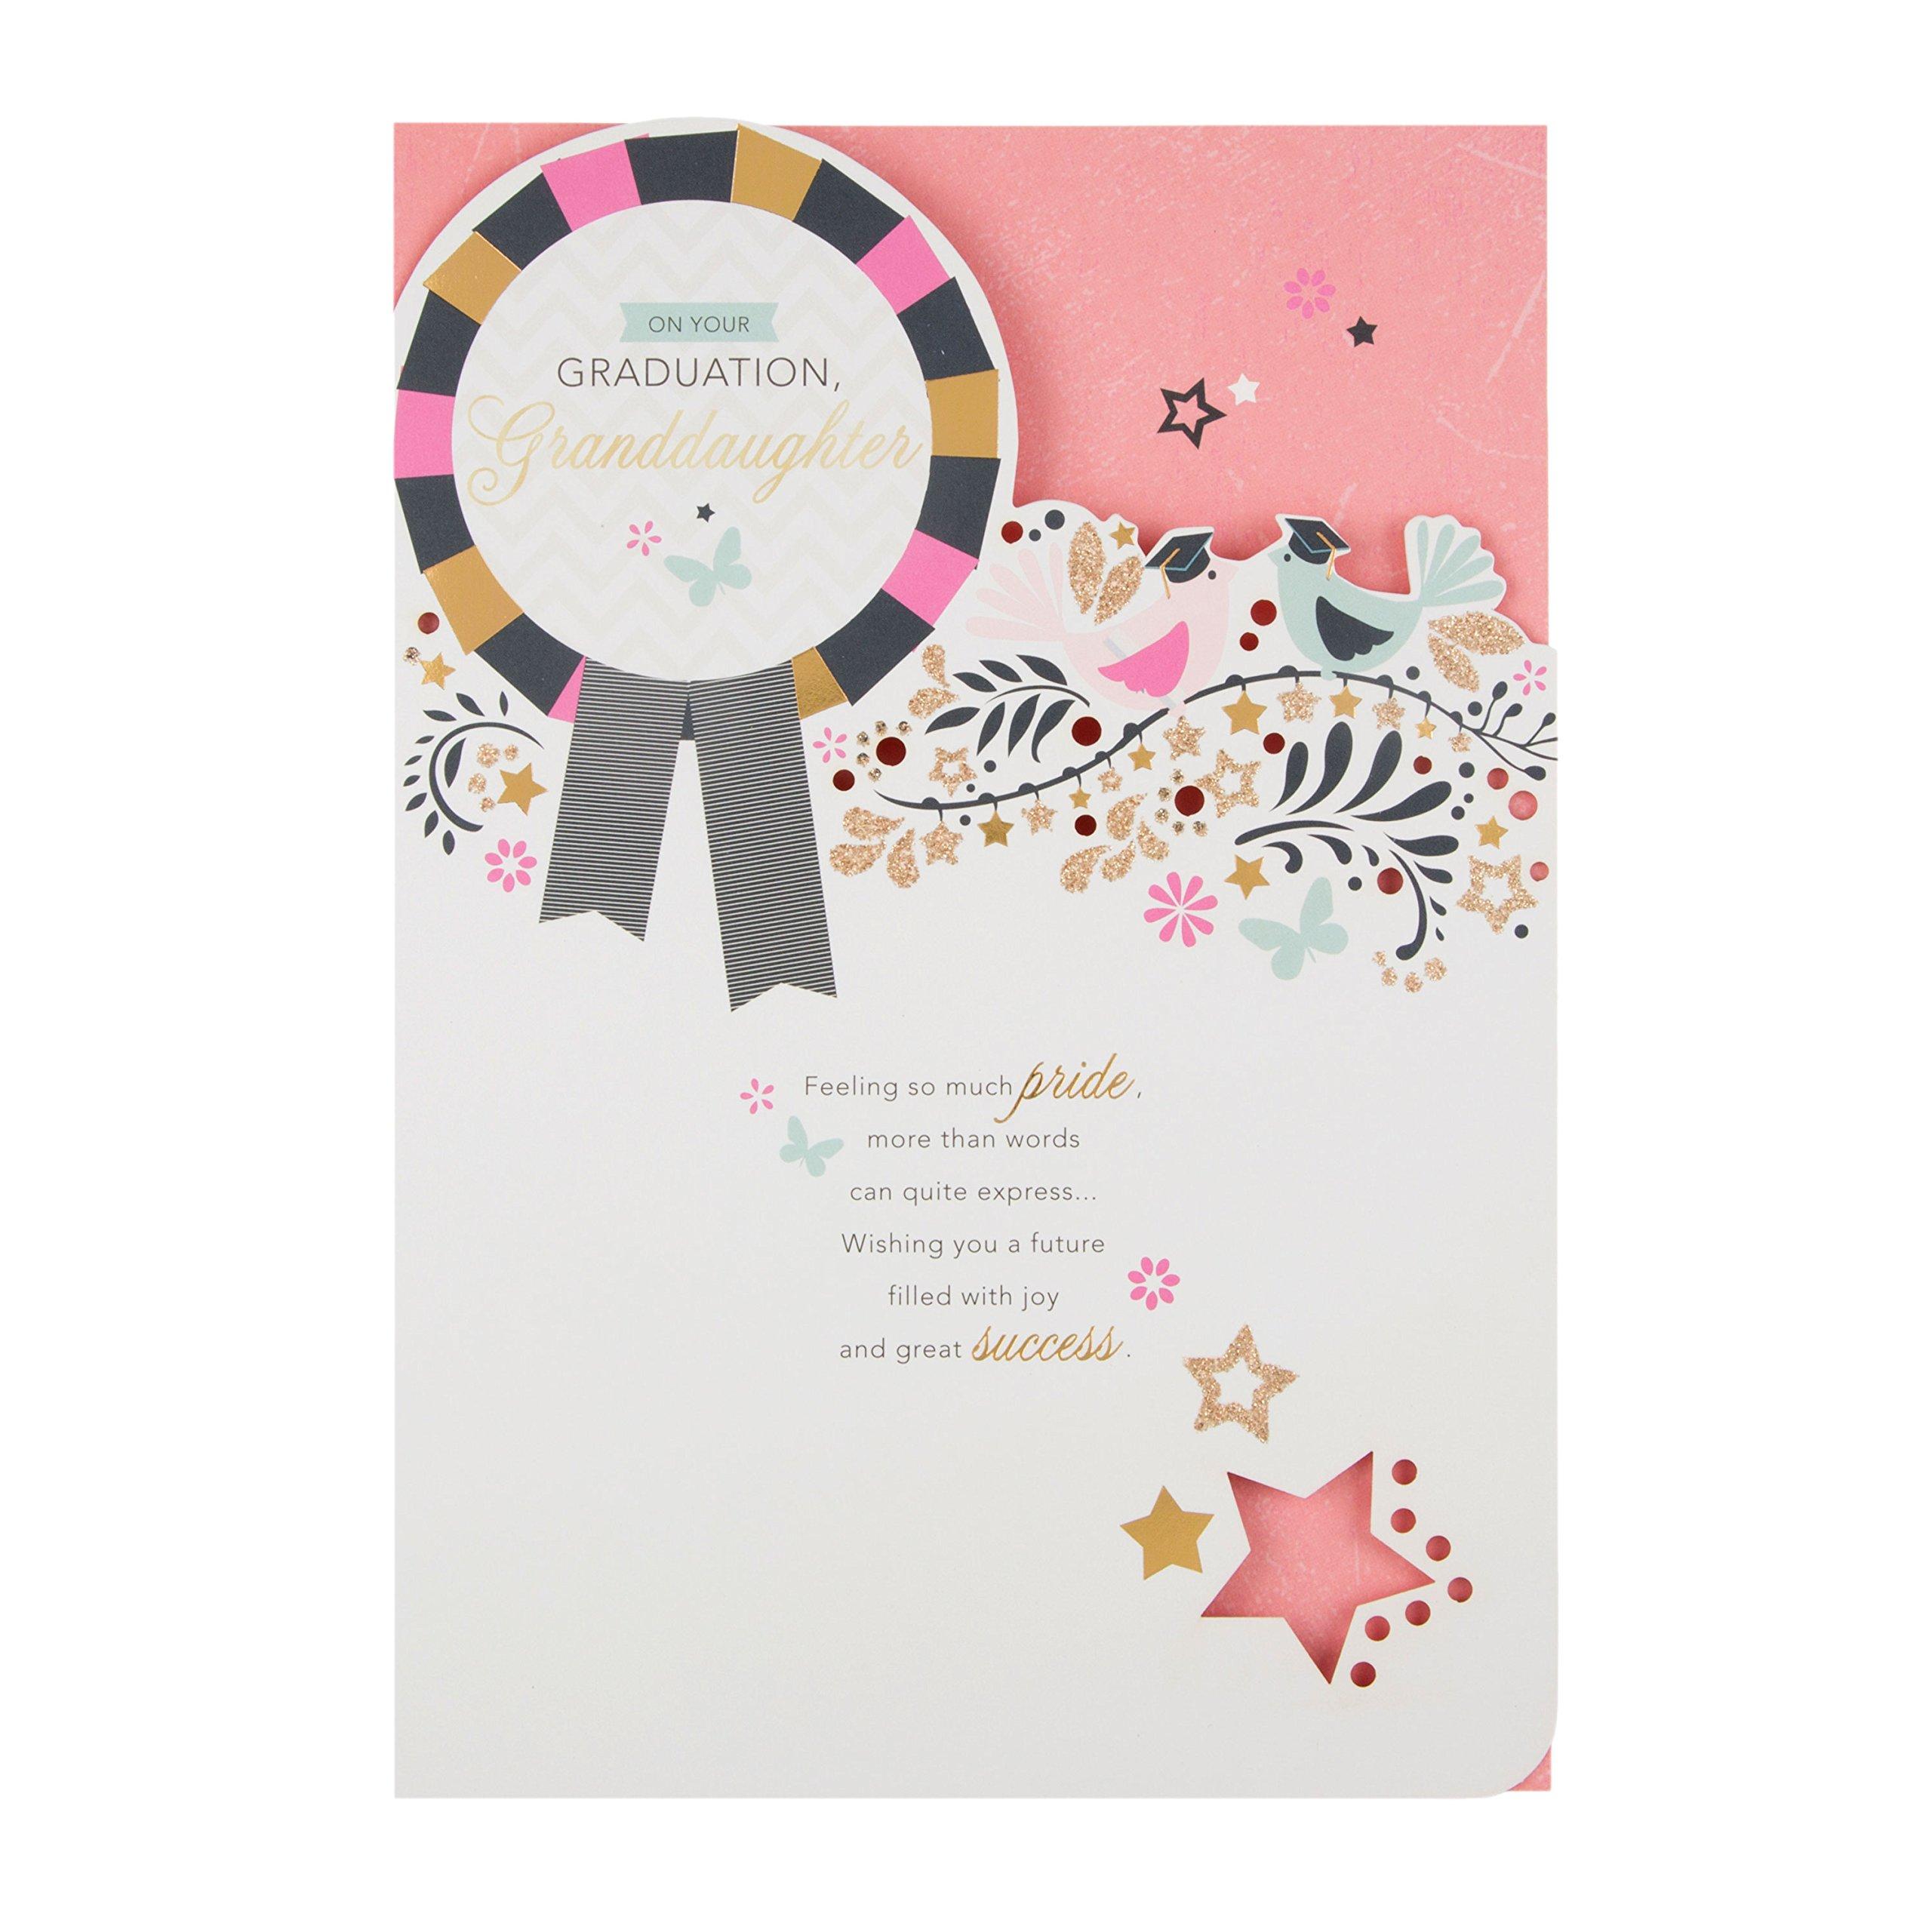 Hallmark 25490396 MediumSo Much Pride Grandson Graduation Card